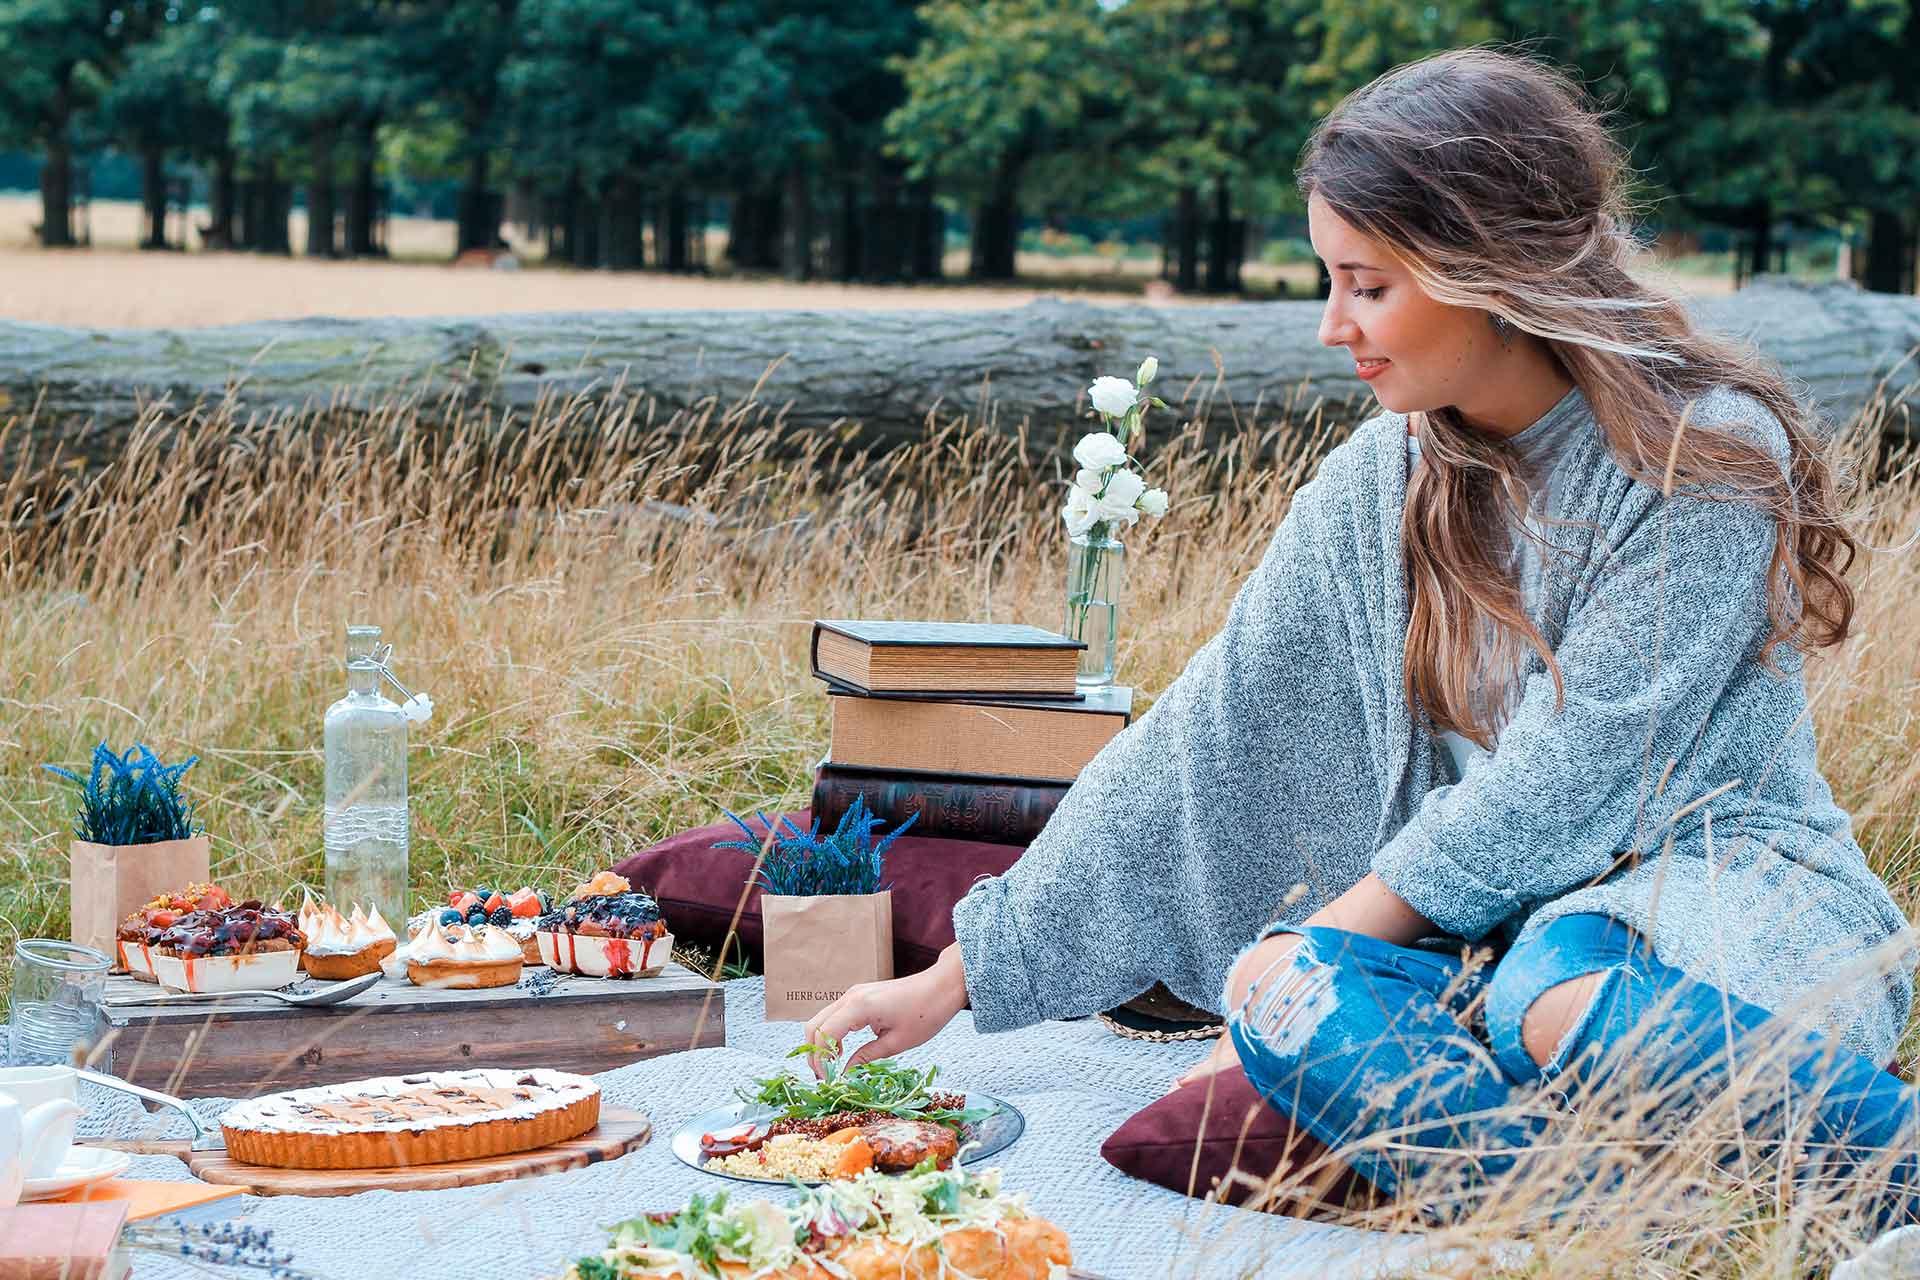 Comer al aire libre